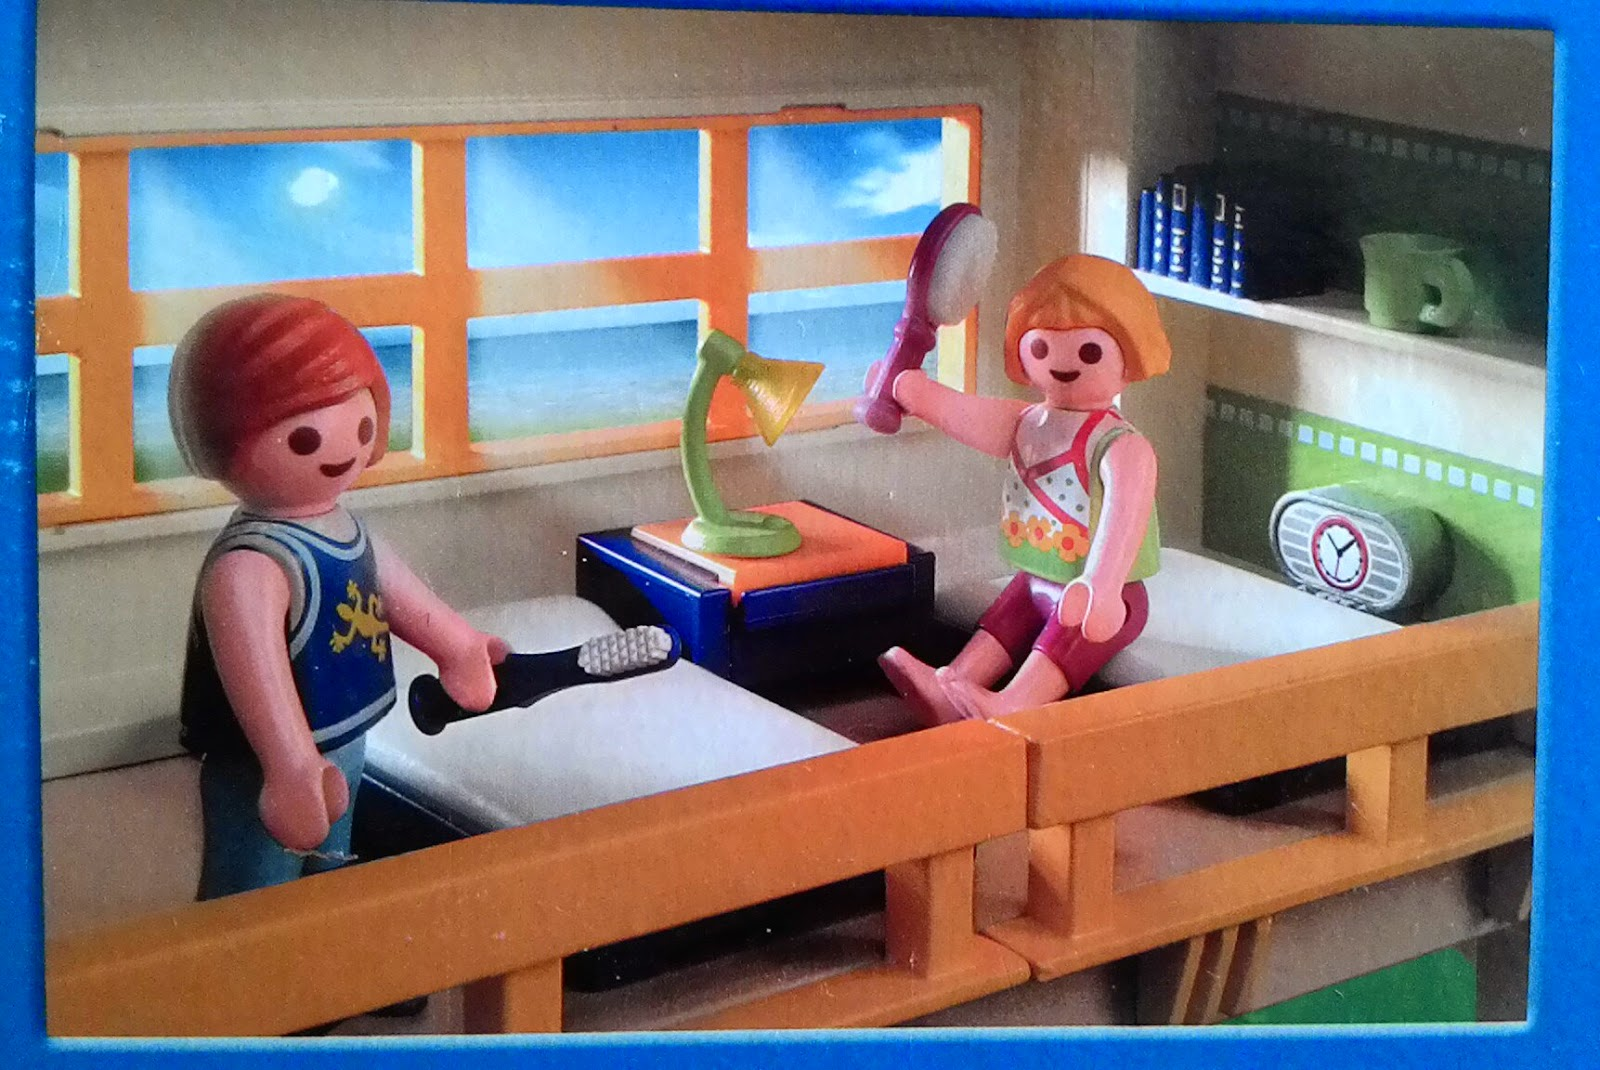 Playmobil-4857-渡假別墅-1   SophiaのPlaymobil摩比玩樂手帳